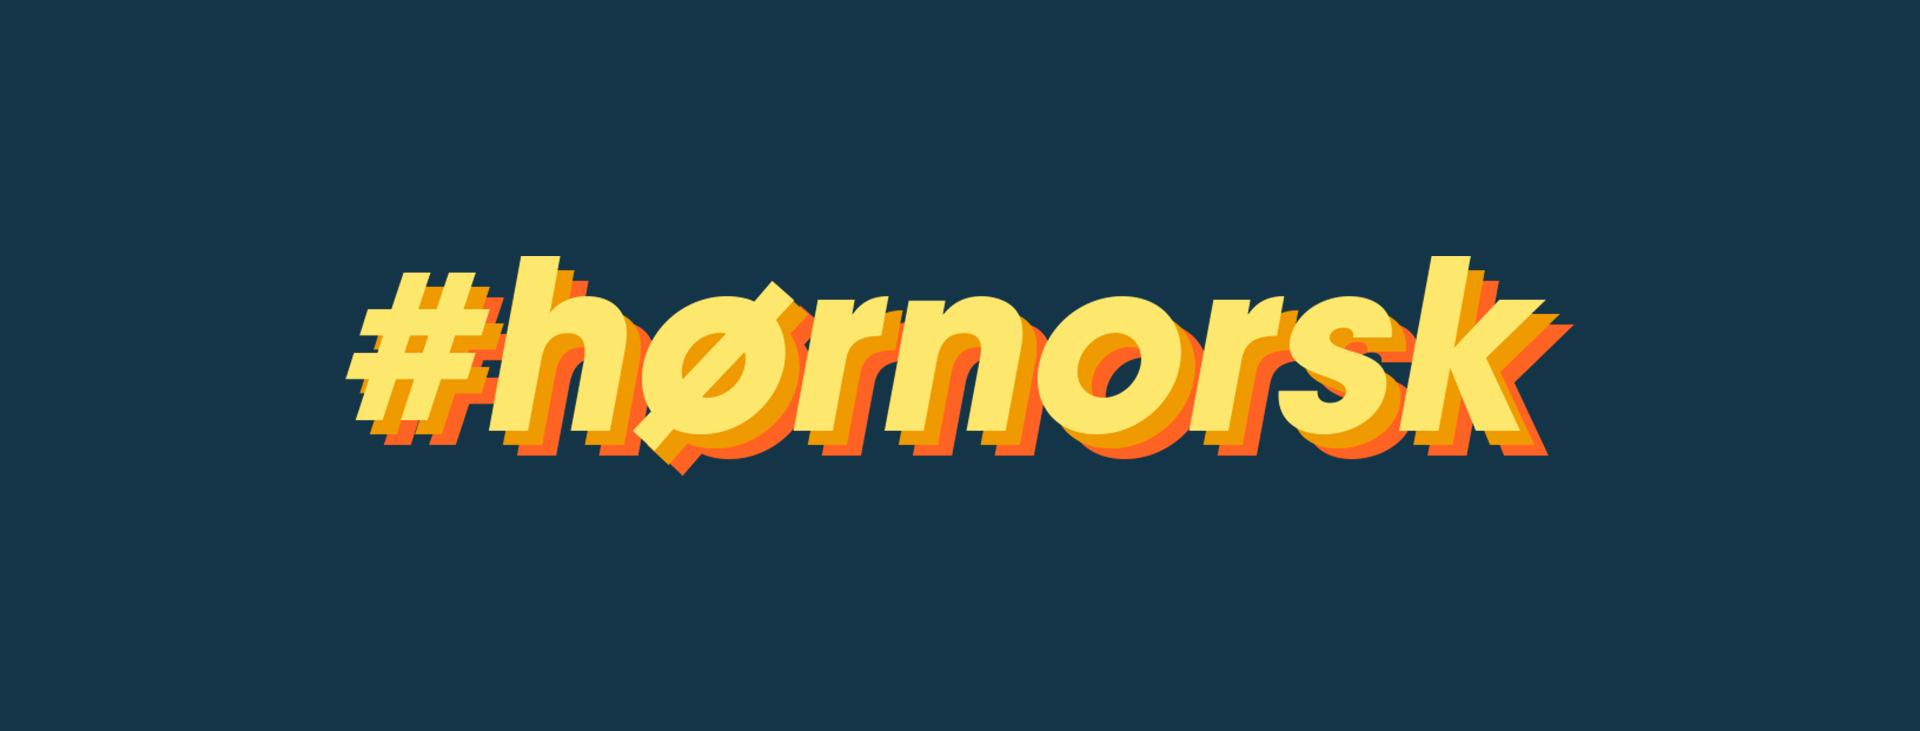 hornorsk